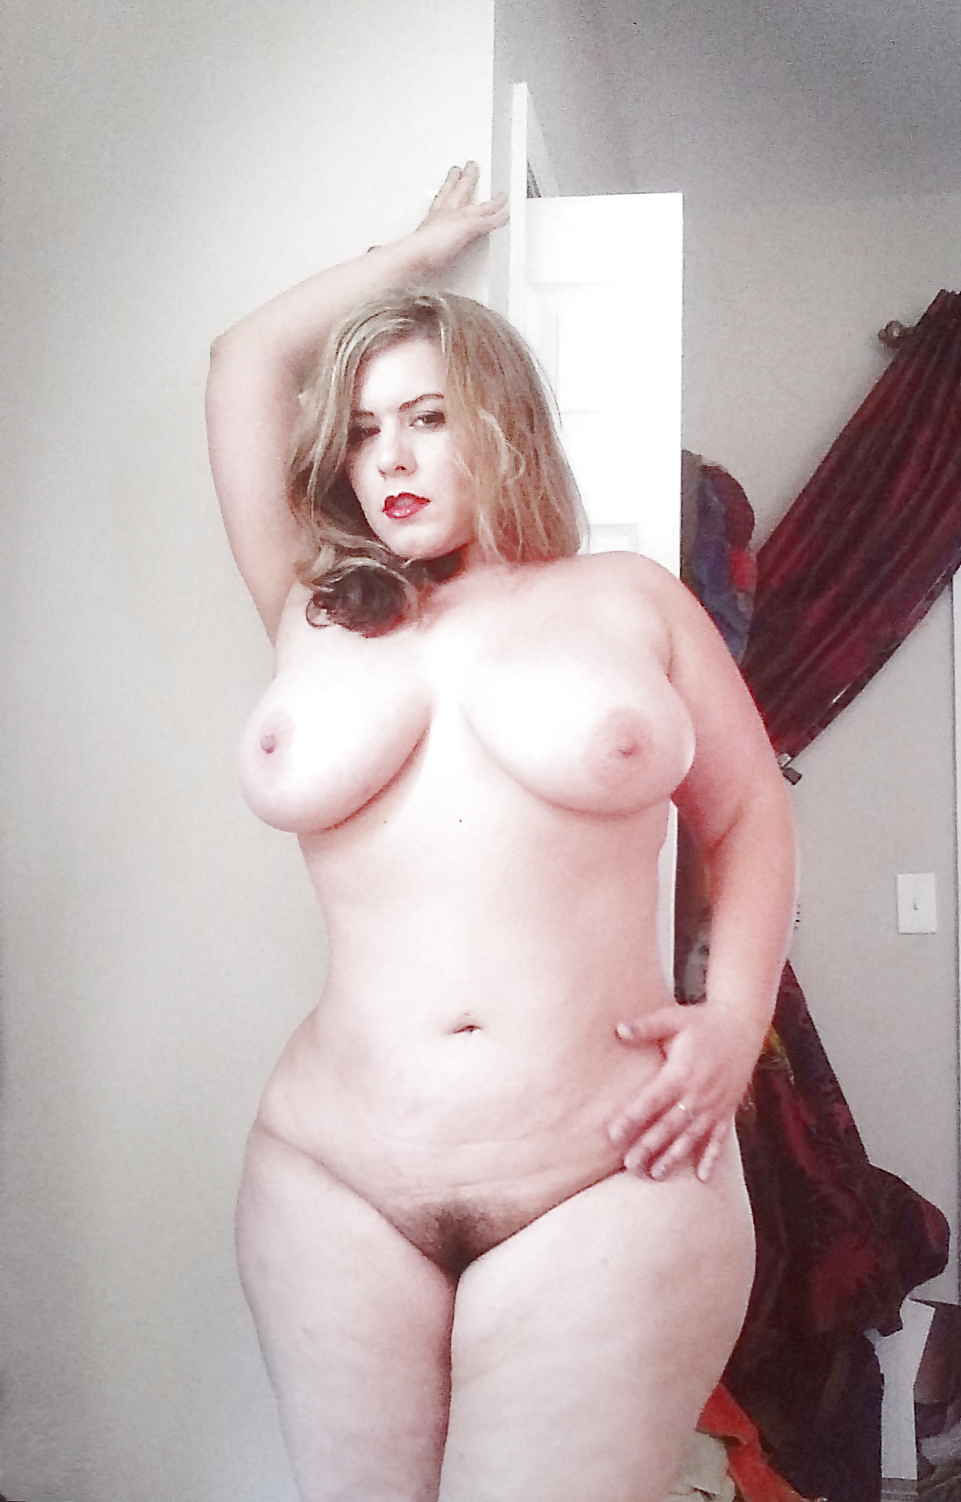 Chubby naked tottys, cheerleaders blow job